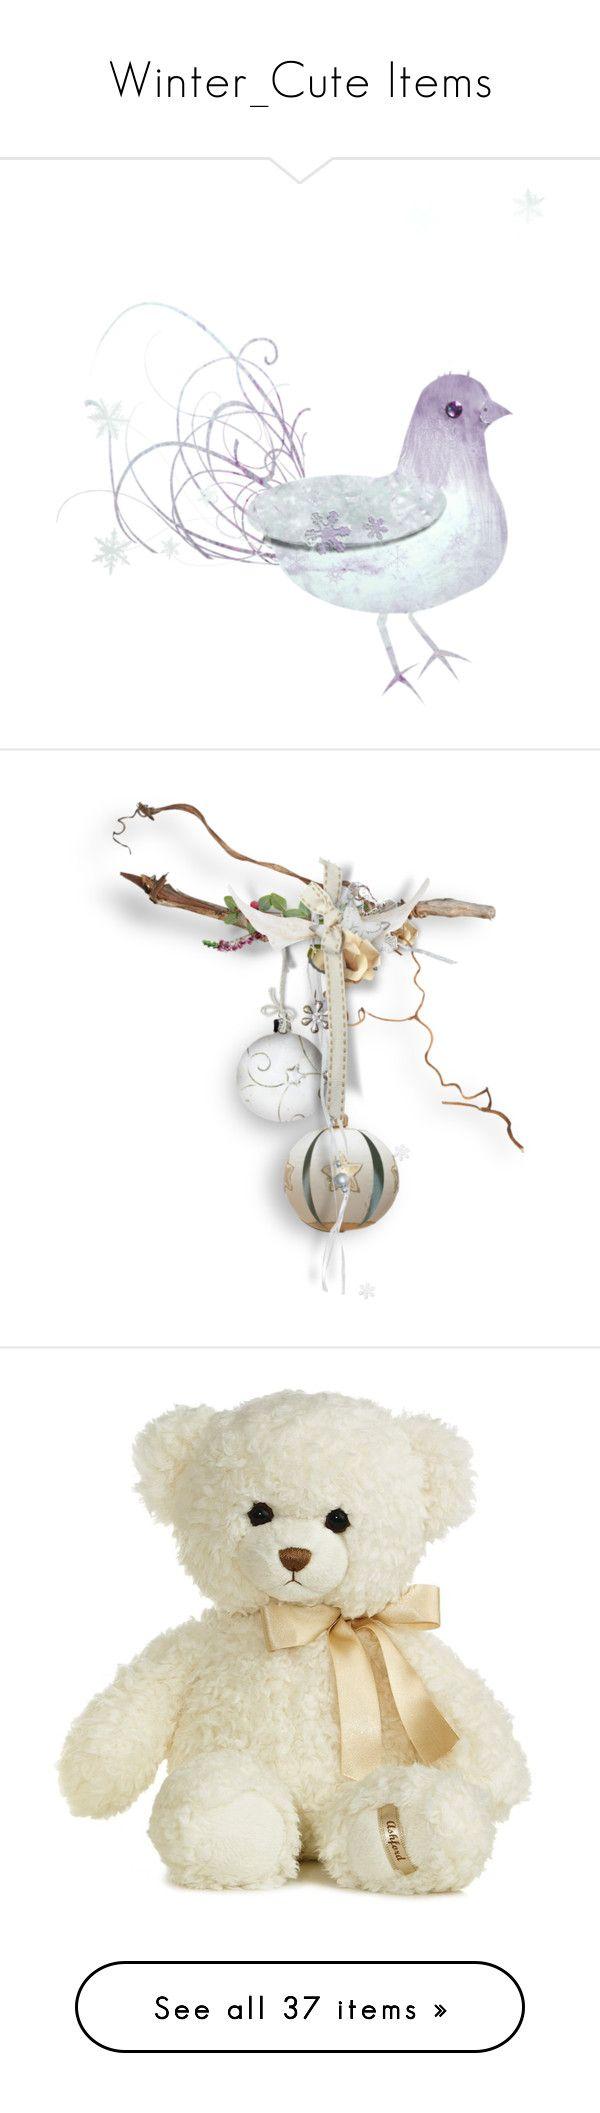 Winter_Cute Items by auntiehelen on Polyvore featuring White Dove, Bells from Branch, White Stuffed Bear, Heart/Grey Bow, Bell/bow, Santa hat/bow center, window, wood floral center, snowflake fairy handbag, fairy ornament, snowy stump, merry Christmas post, wood frames, snowman decorations, bear, dove/pole, star, clock/pole, ornament center, snowmen, crystal kitty santa, manger nativity scene, santas, reindeer, owl, elves, santas bag, pointsetta, mailbox decoration, candles, snowman w/boys…